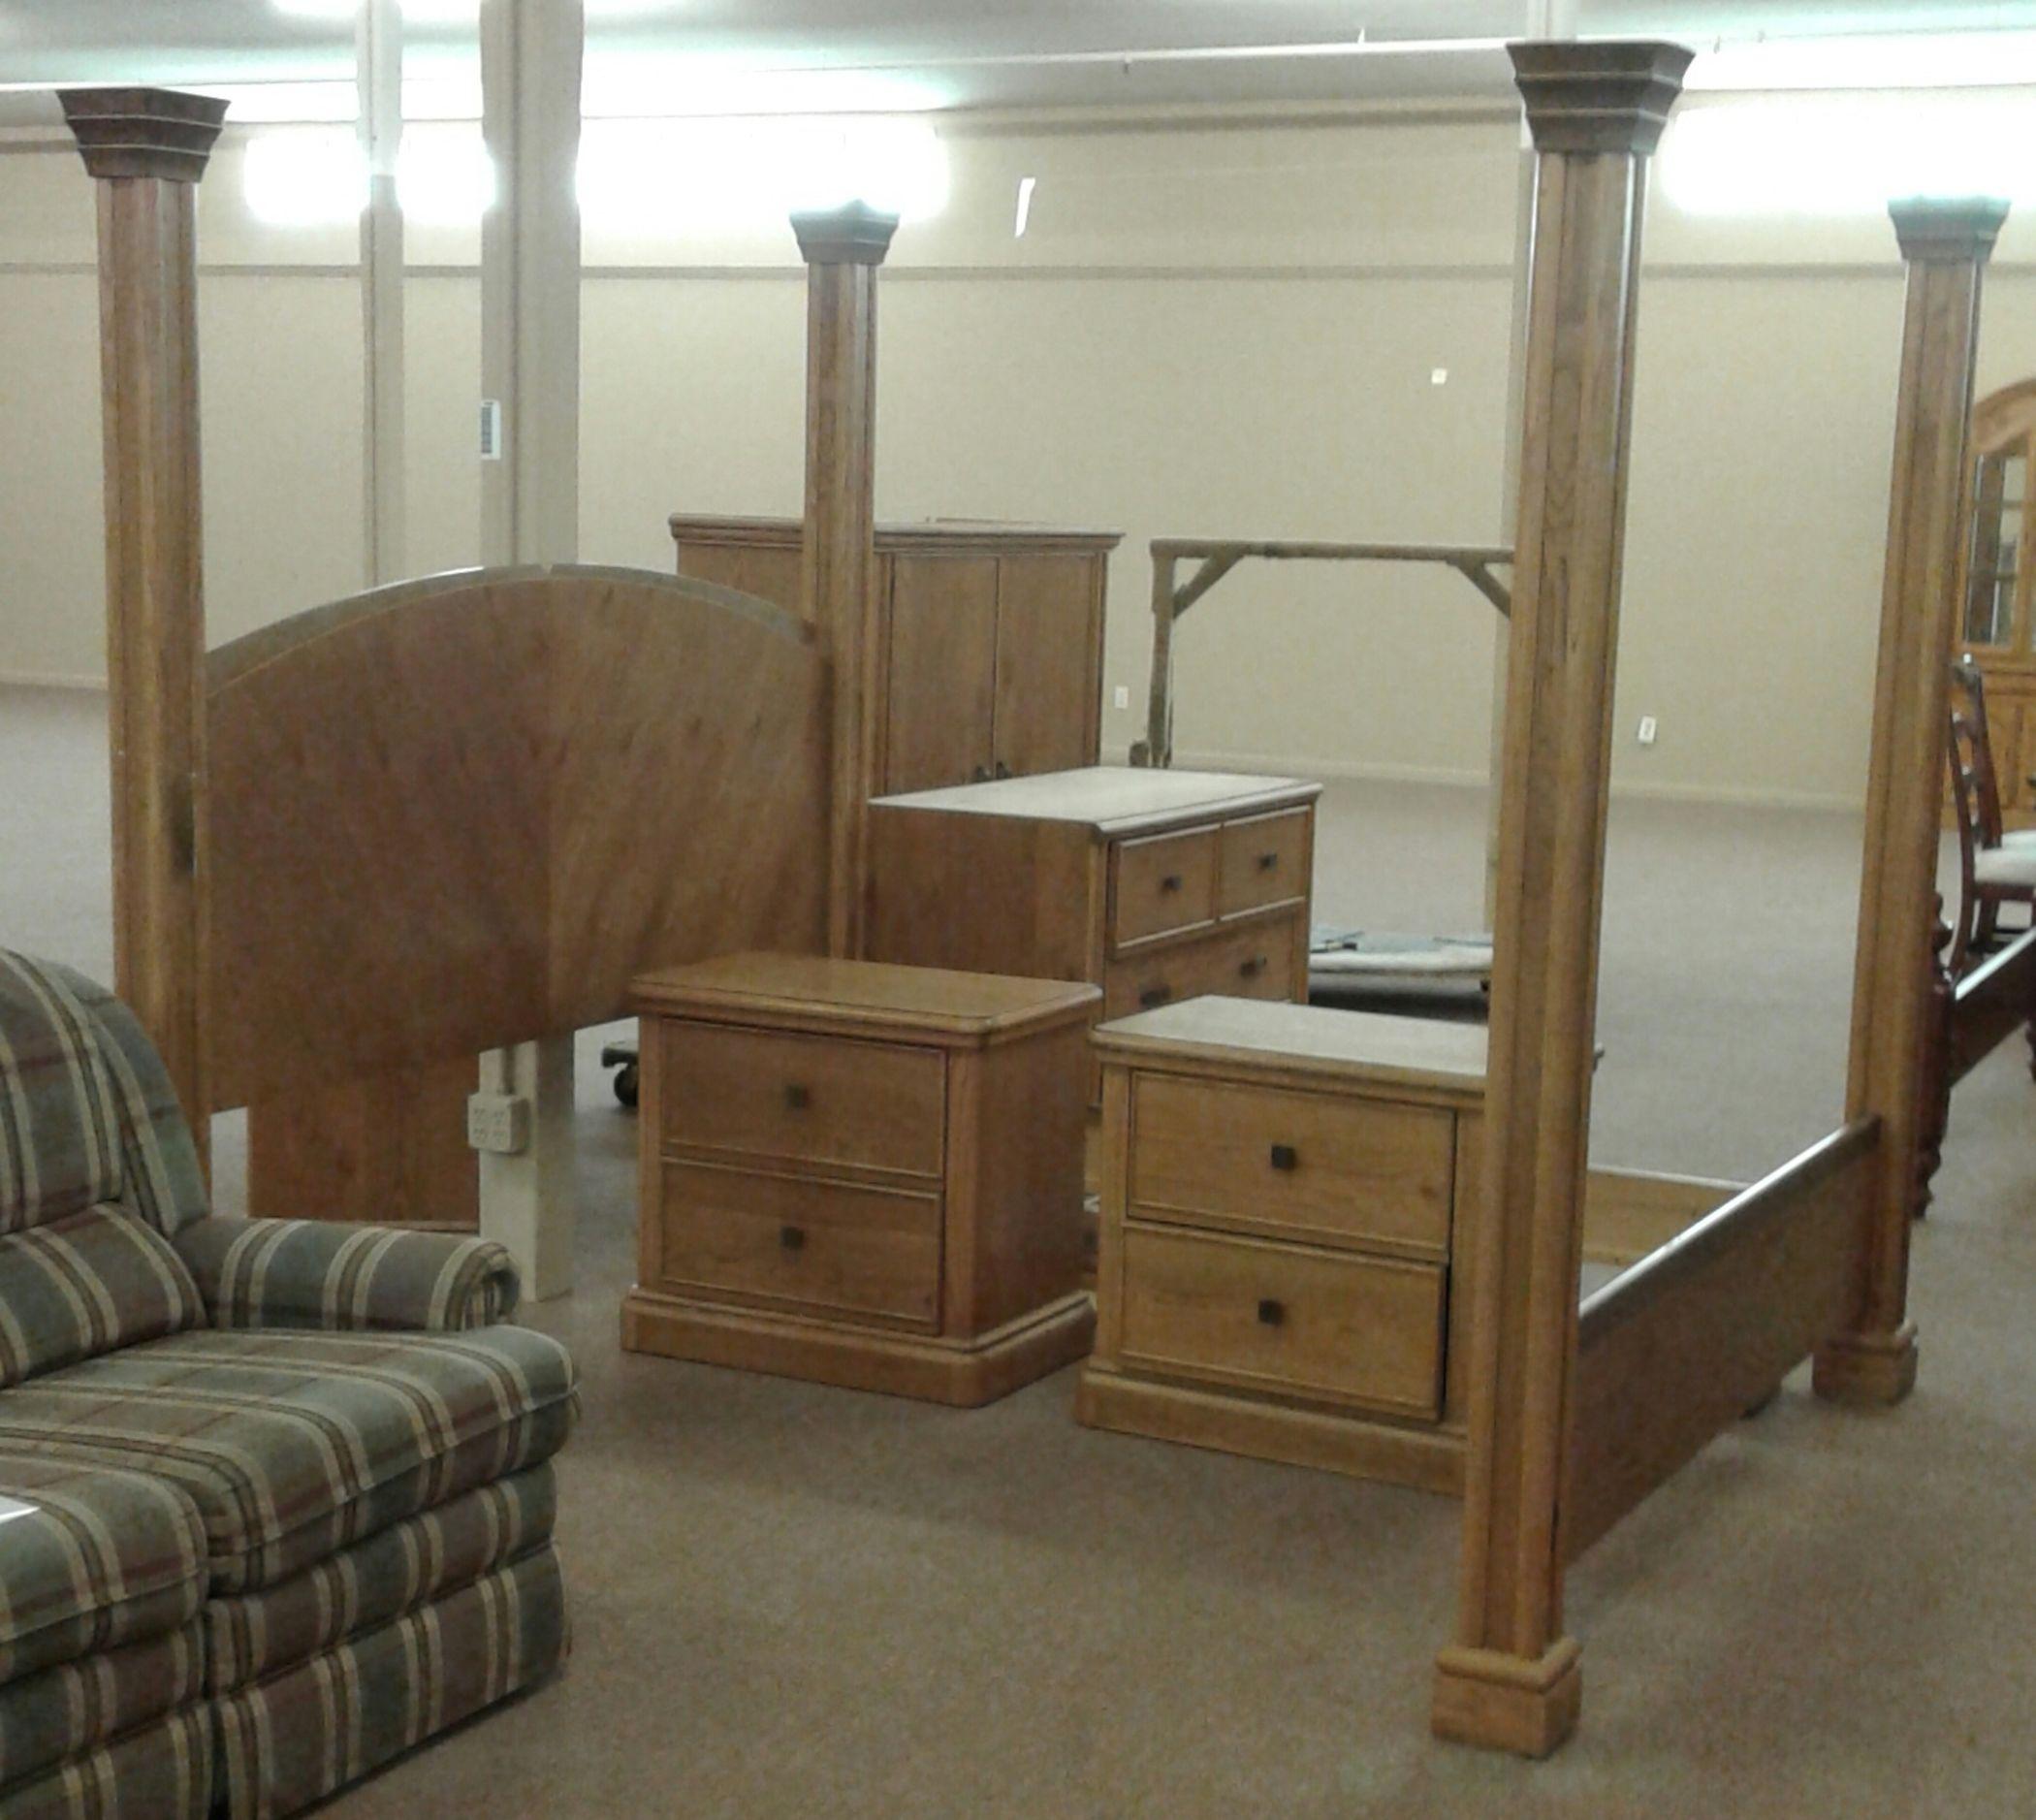 LANE OAK KING BED | Delmarva Furniture Consignment